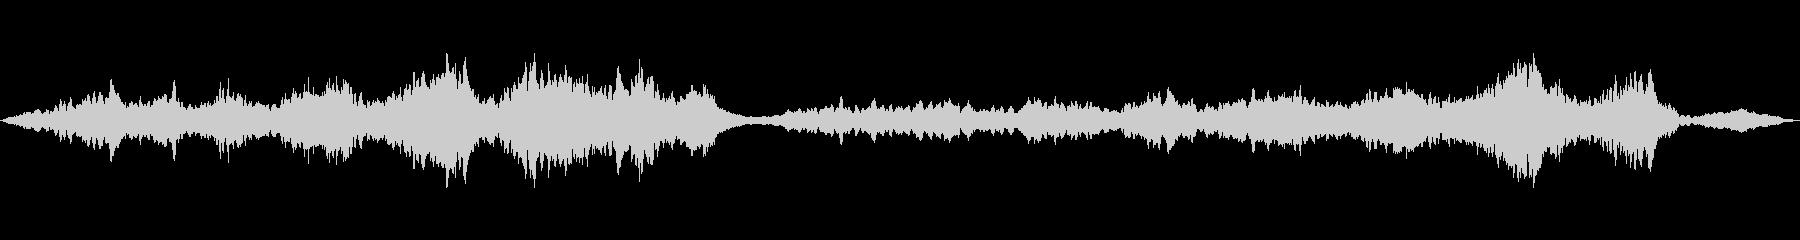 DeepBlueKURAGE60アンビの未再生の波形